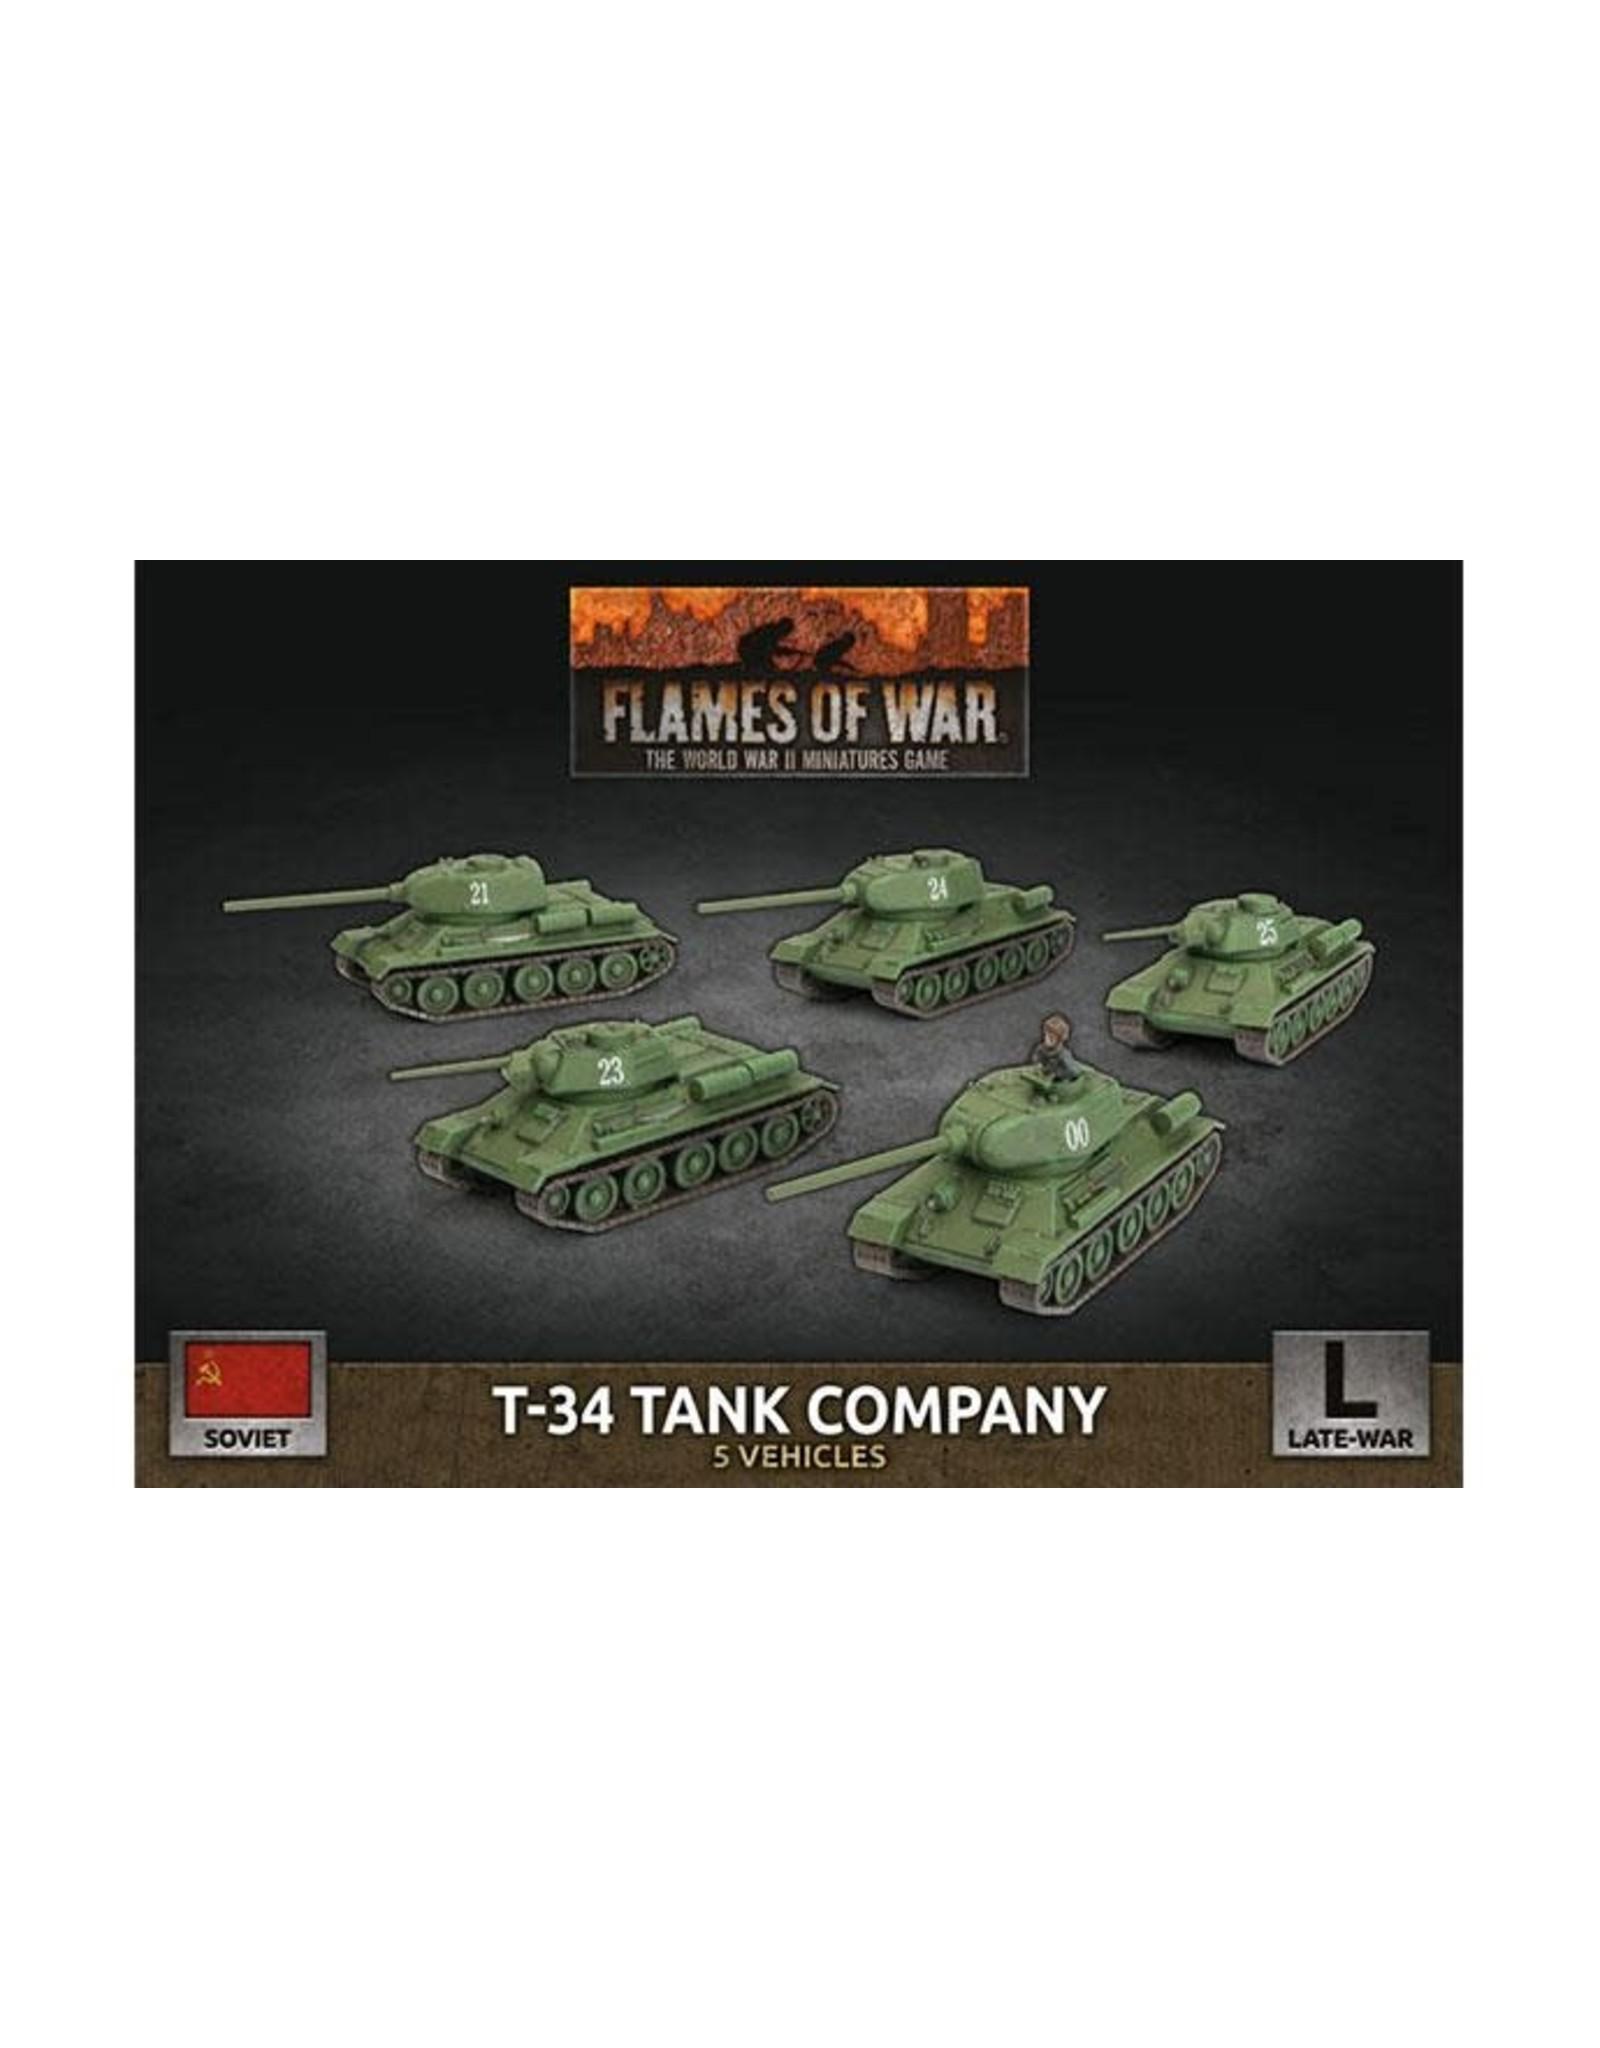 Battlefront Miniatures T-34 Tank Company